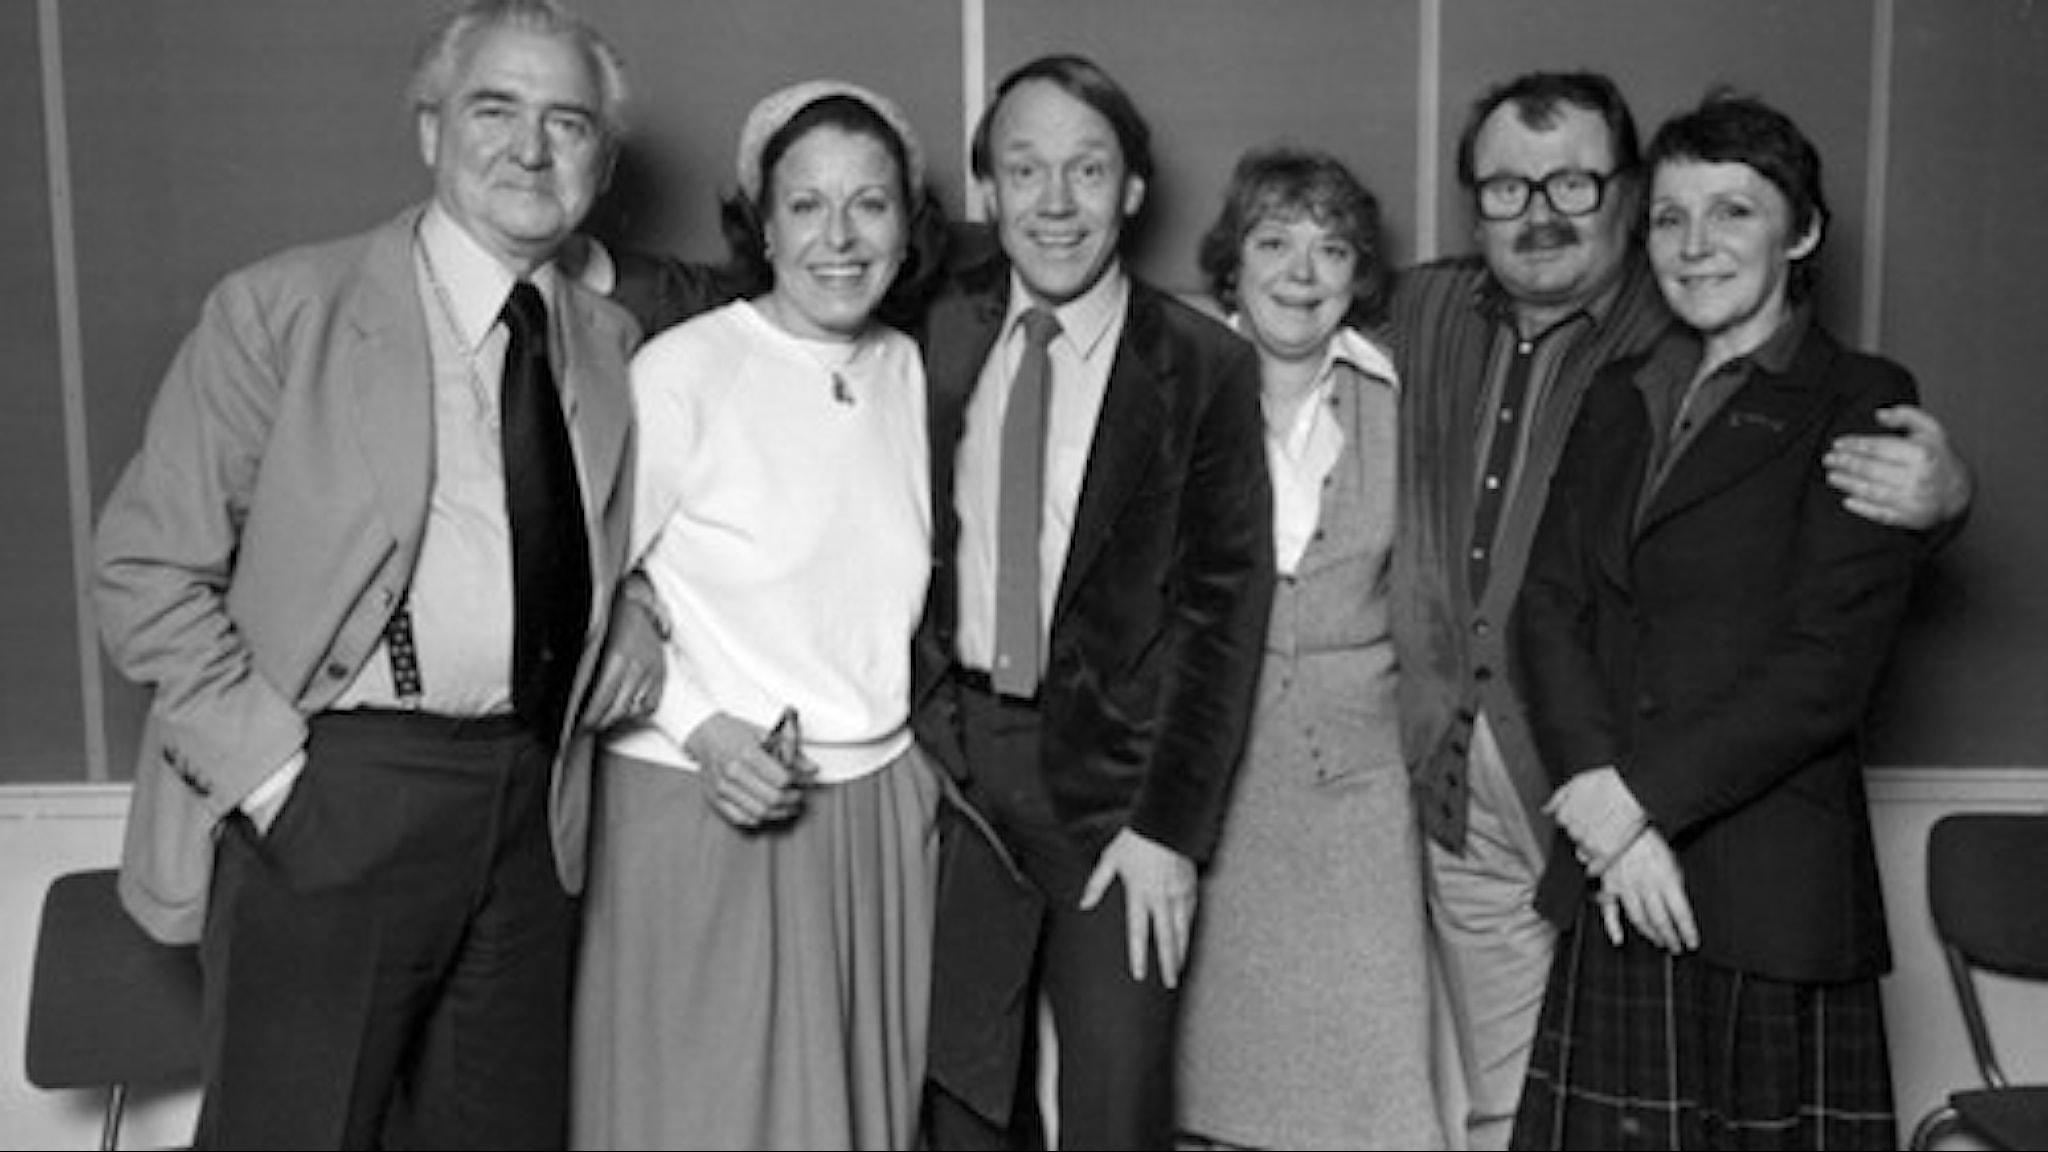 Stig Järrel, Margaretha Krook, Lennart Swahn, Ursula Richter, Molatas Erikson och Cathrin Westerlund.